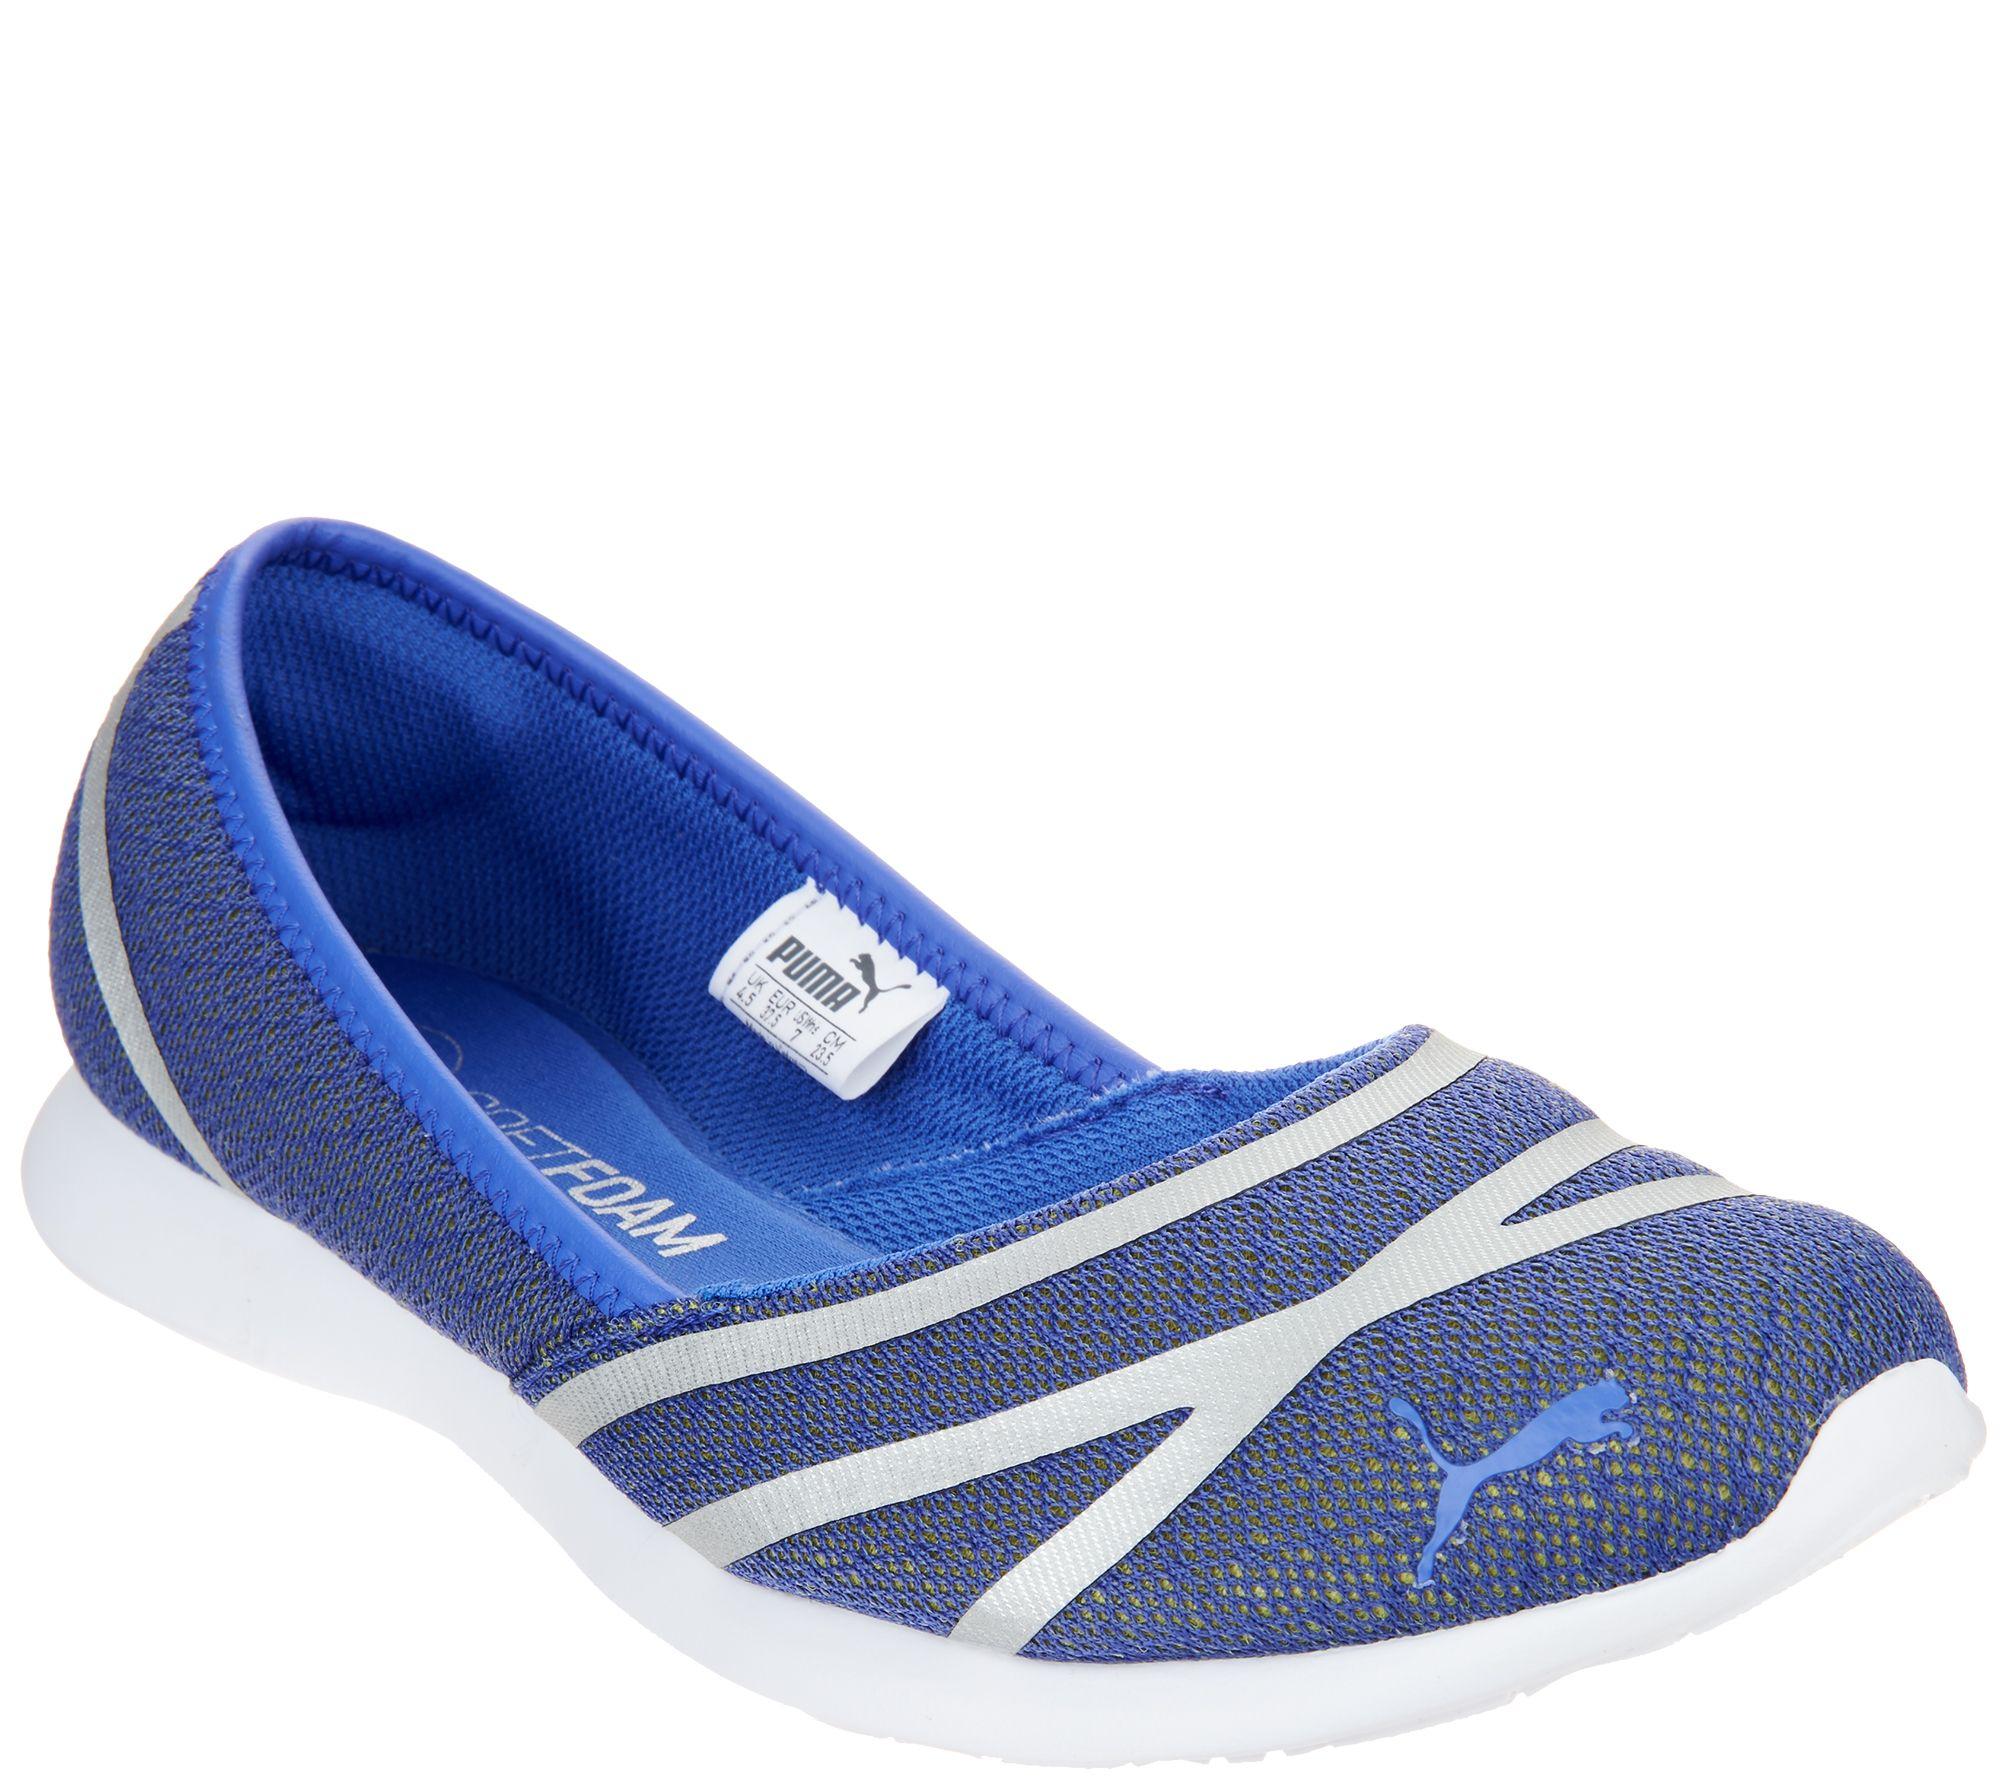 5bcf76d9f77 PUMA Mesh Slip-On Ballet Sneakers - Vega Ballet Mesh - Page 1 — QVC.com